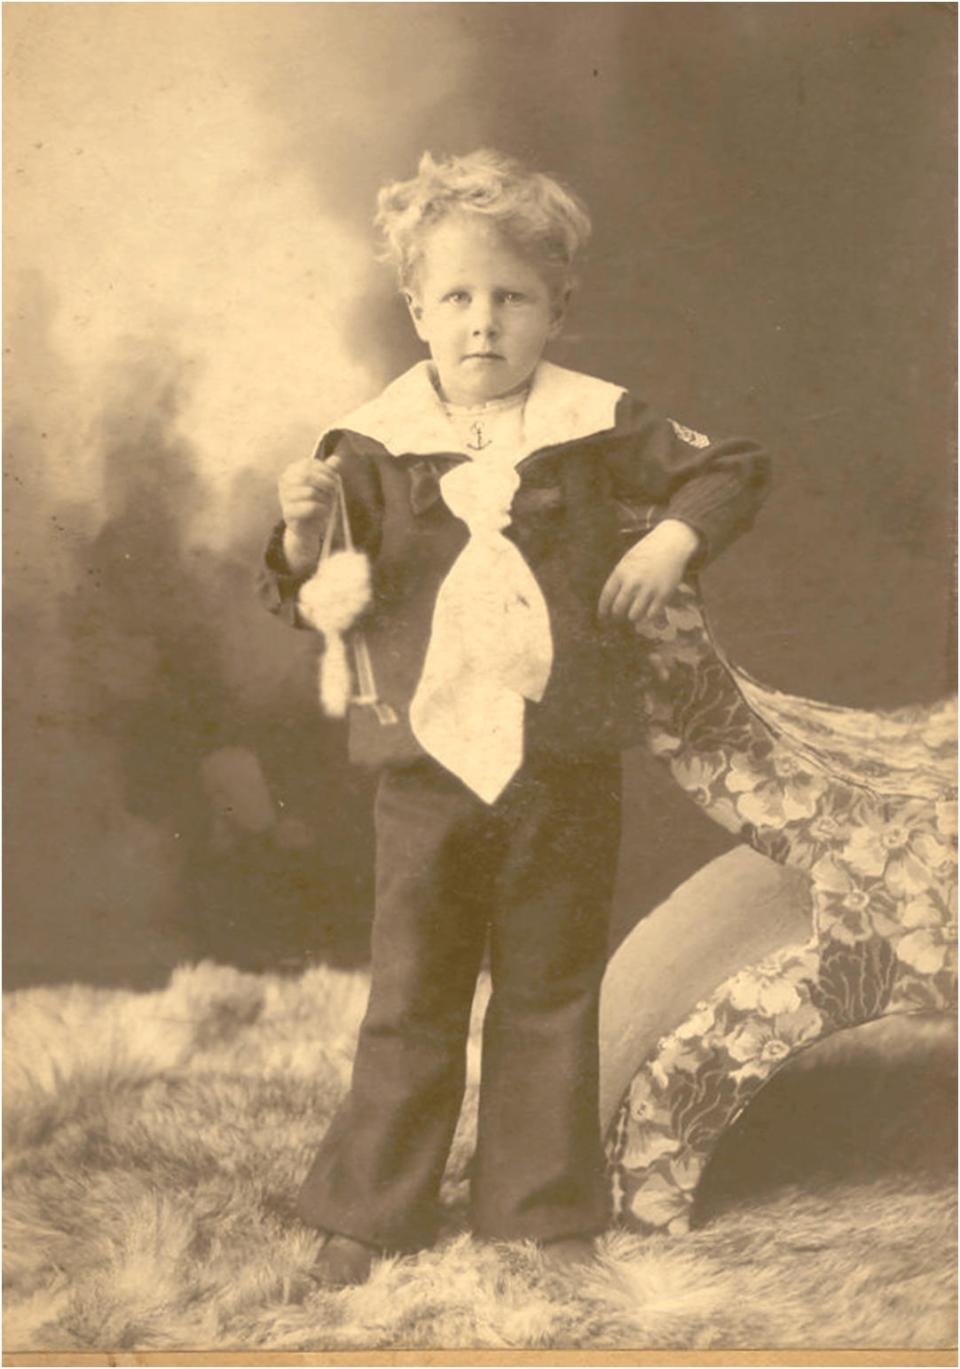 Sydney Winterbottom, age 5.